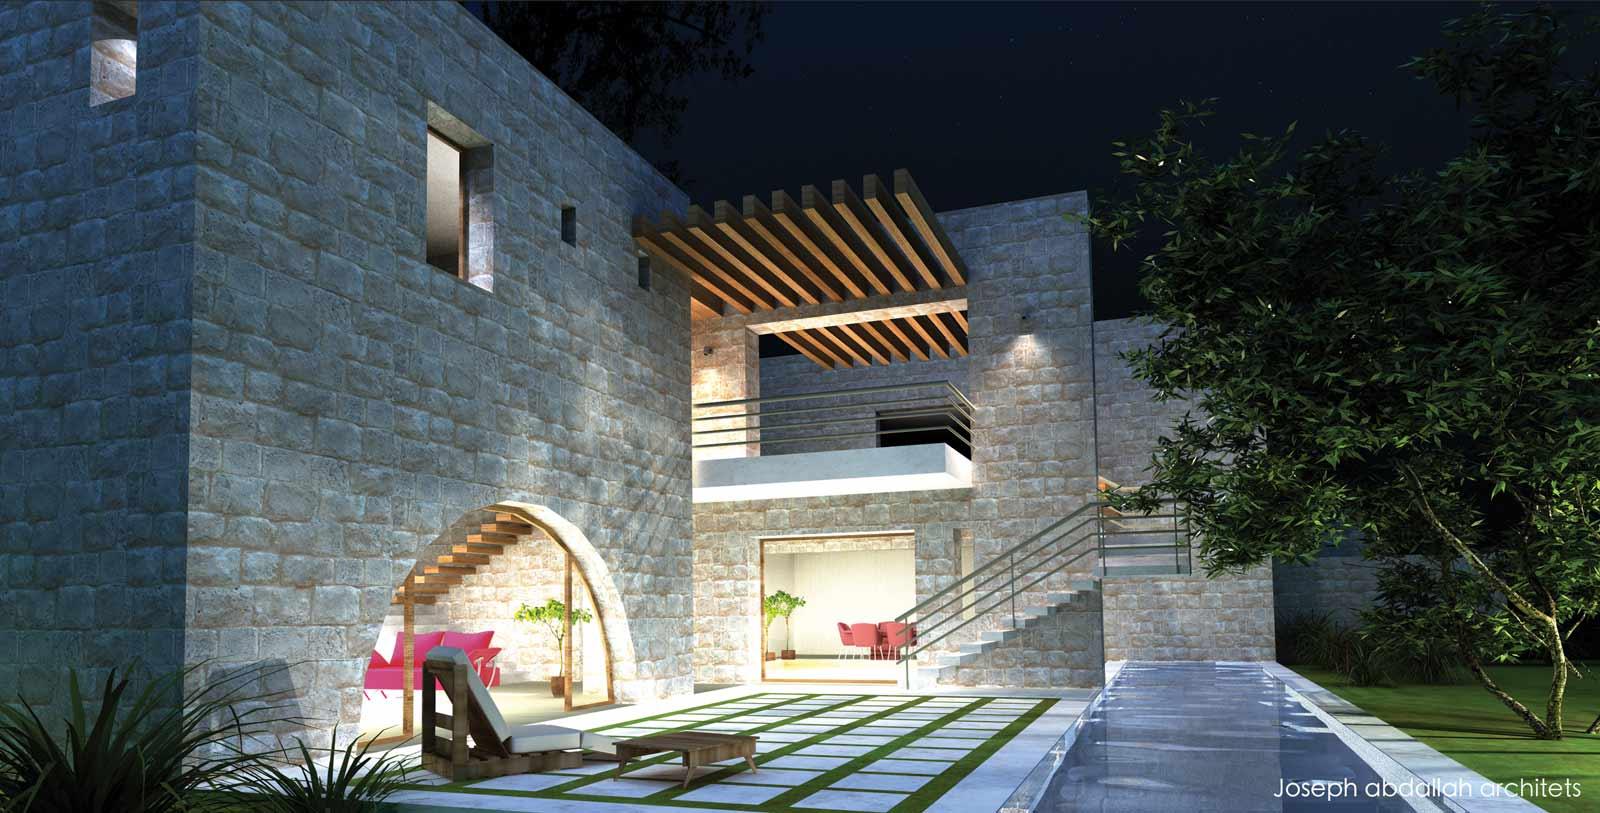 domaine-du-chene-lebanese-traditional-achitecture-joseph-abdallah-architects-villa3a